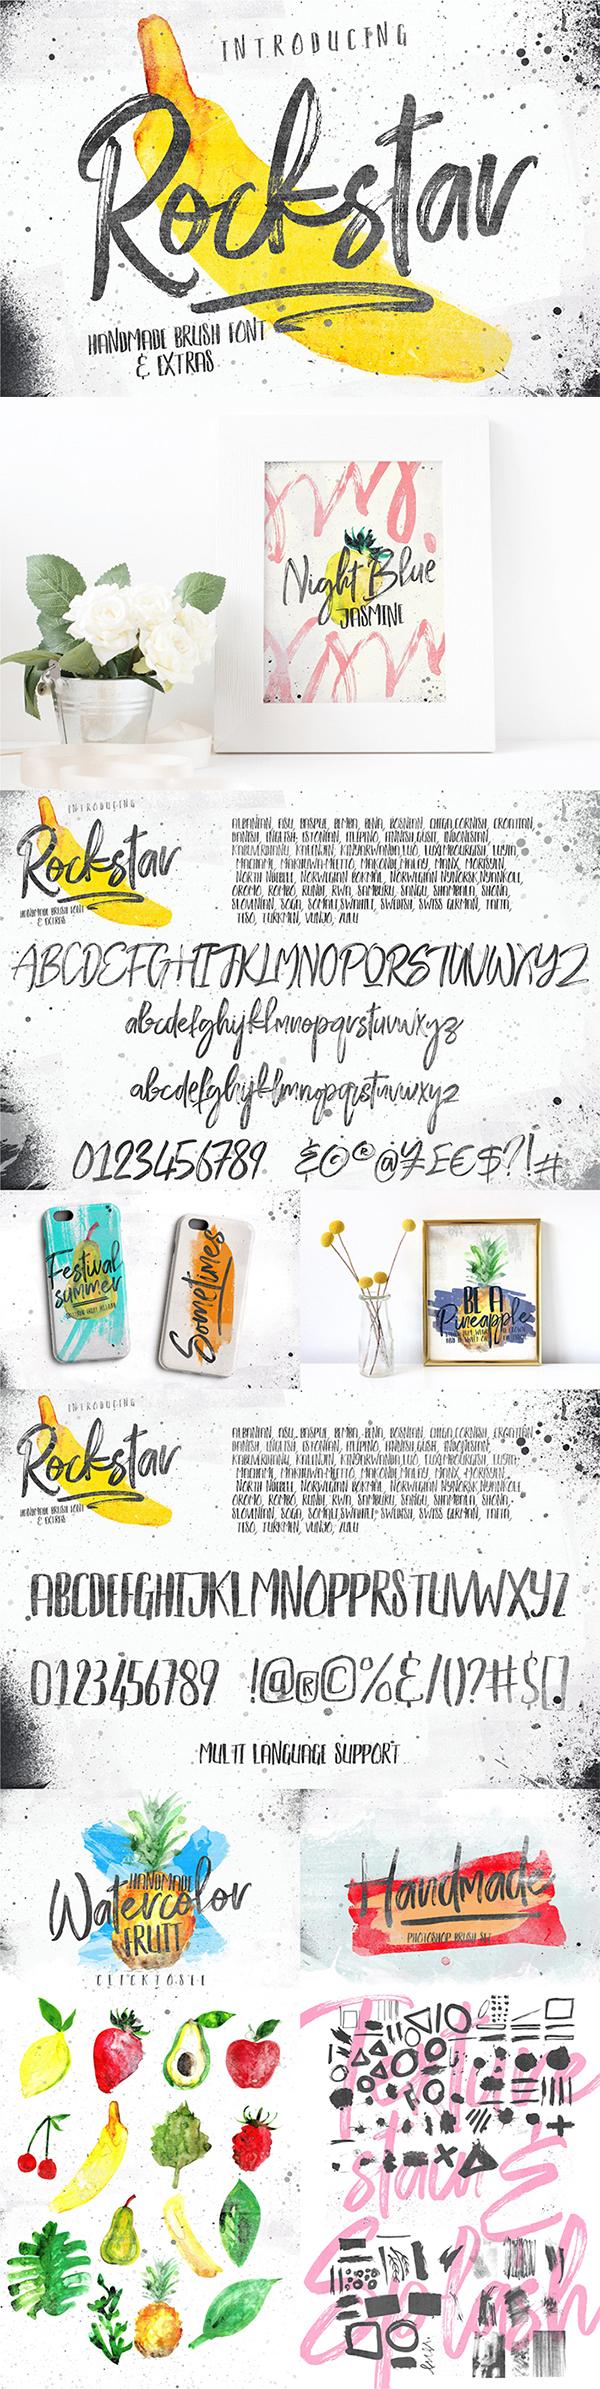 Handmade Brush Font & Photoshop Brush Set Free Download